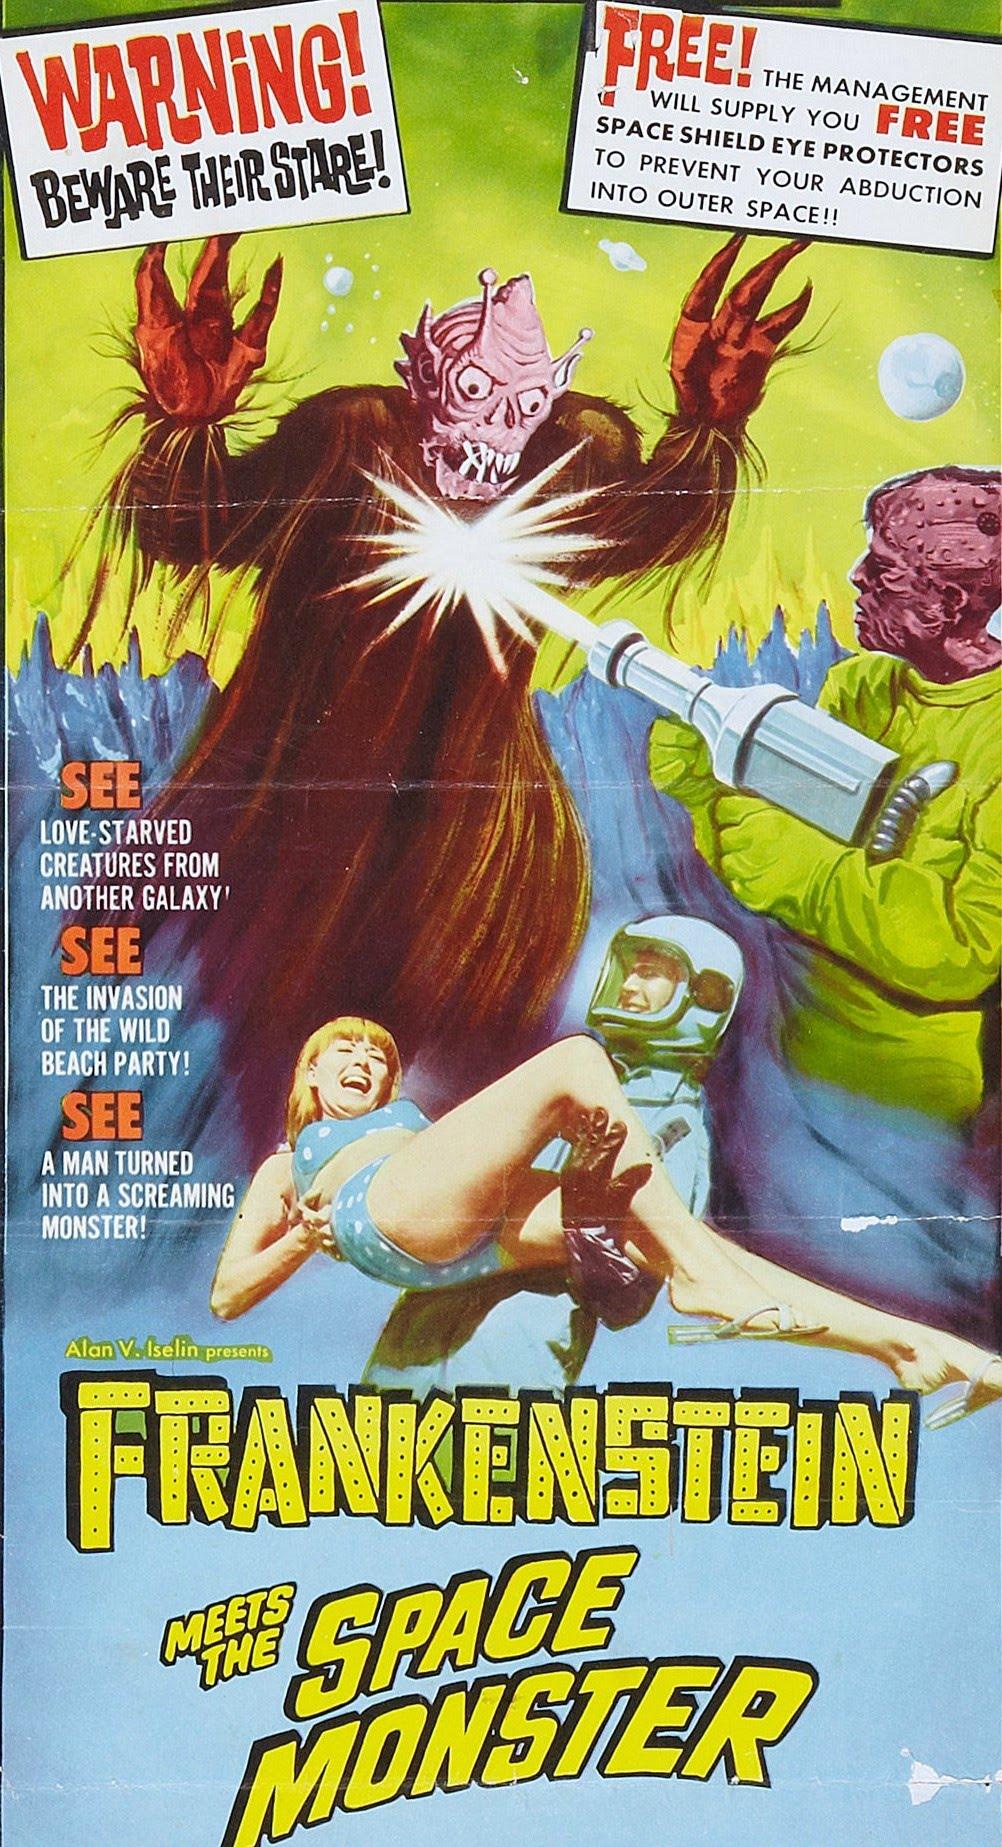 frankenstein-meets-the-space-monster-4kite44frankenstein-meets-the-space-monster-4frankenstein-meets-the-space-monster-19frankenstein-meets-the-space-monster-27frankenstein-meets-the-space-monster-2